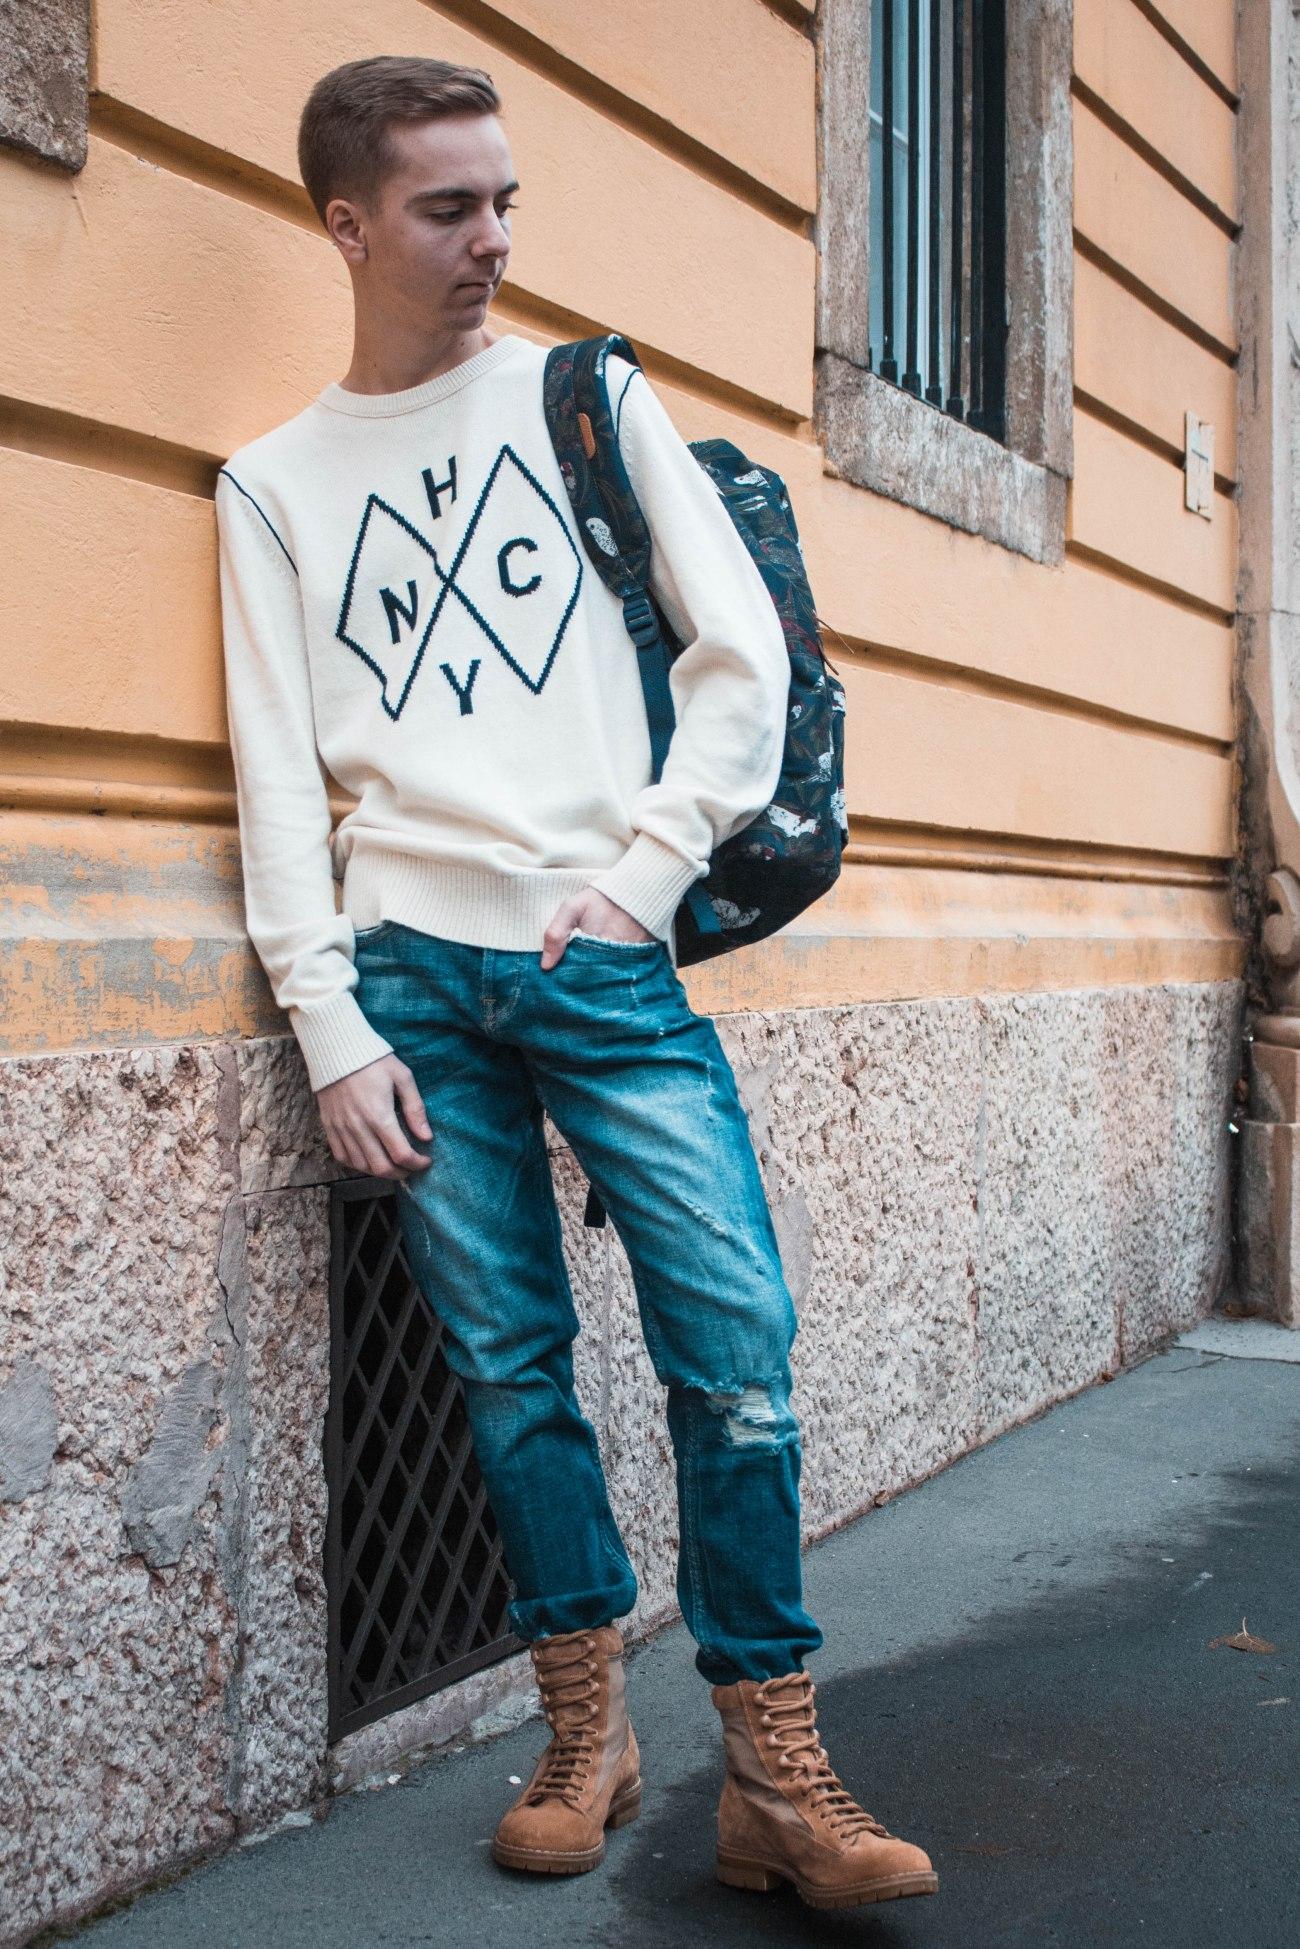 balazs-zsalek-blog-everyday-outfit-tommy-hilfiger-herschel.5